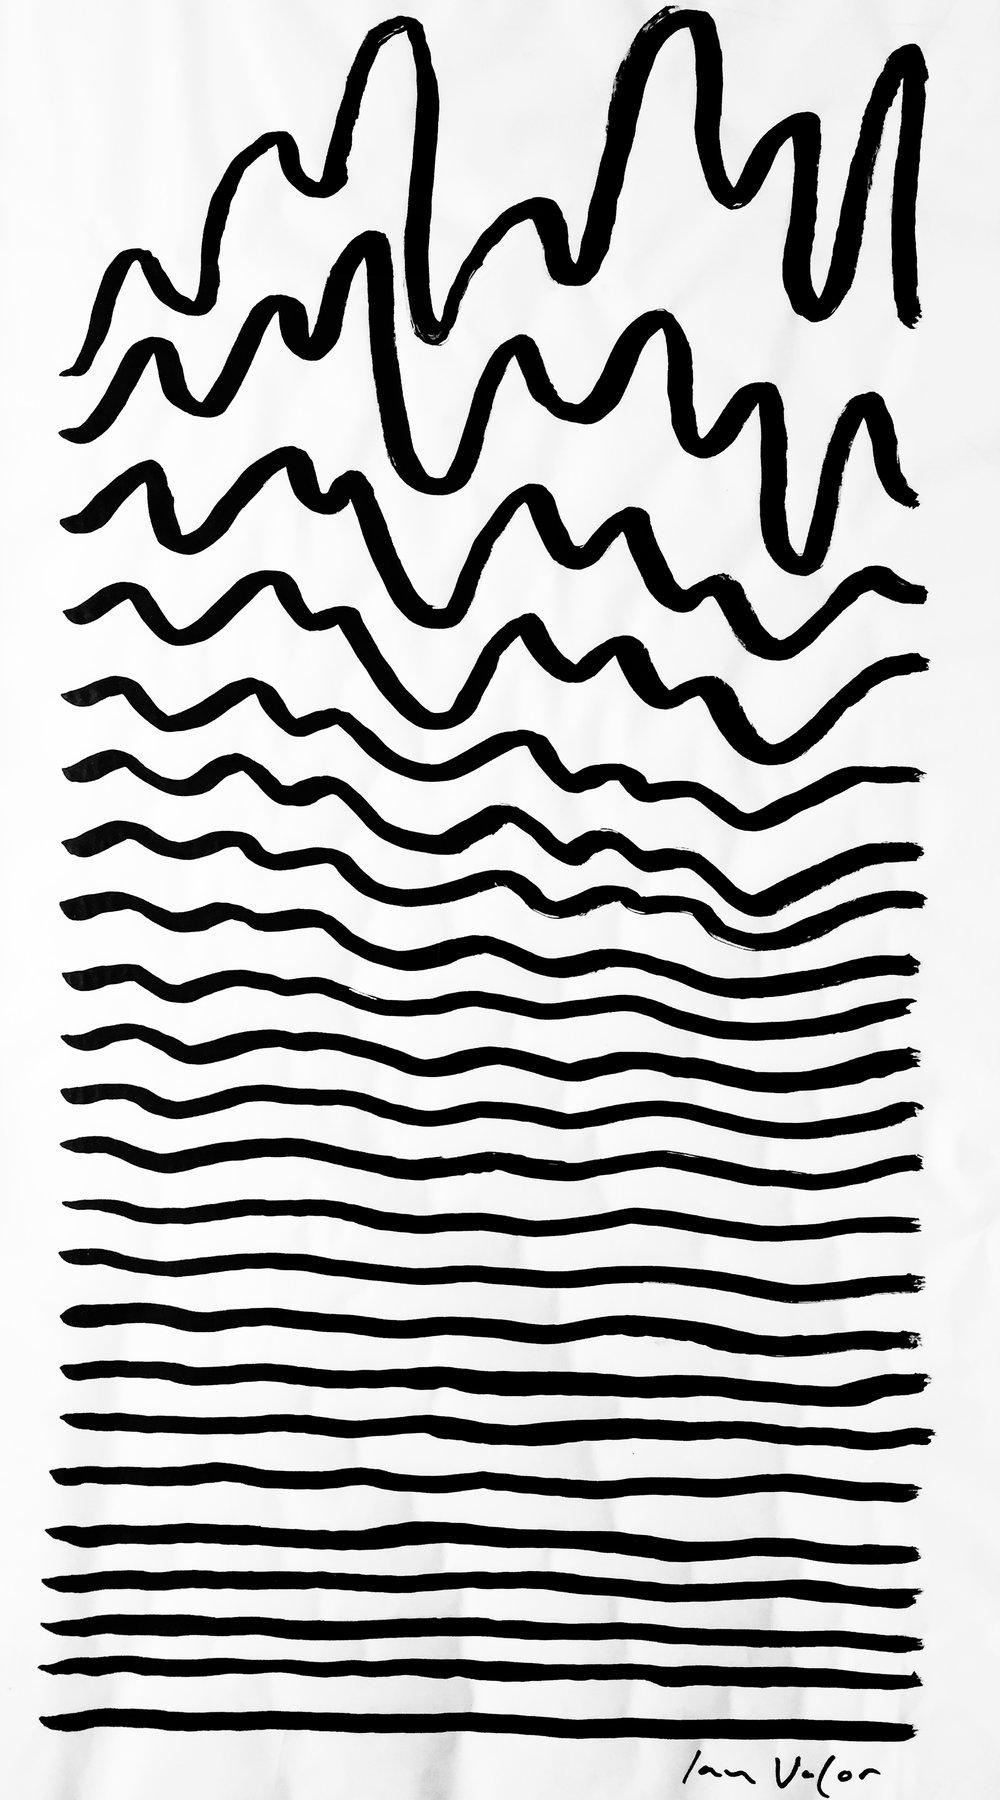 Future Waves, 2017